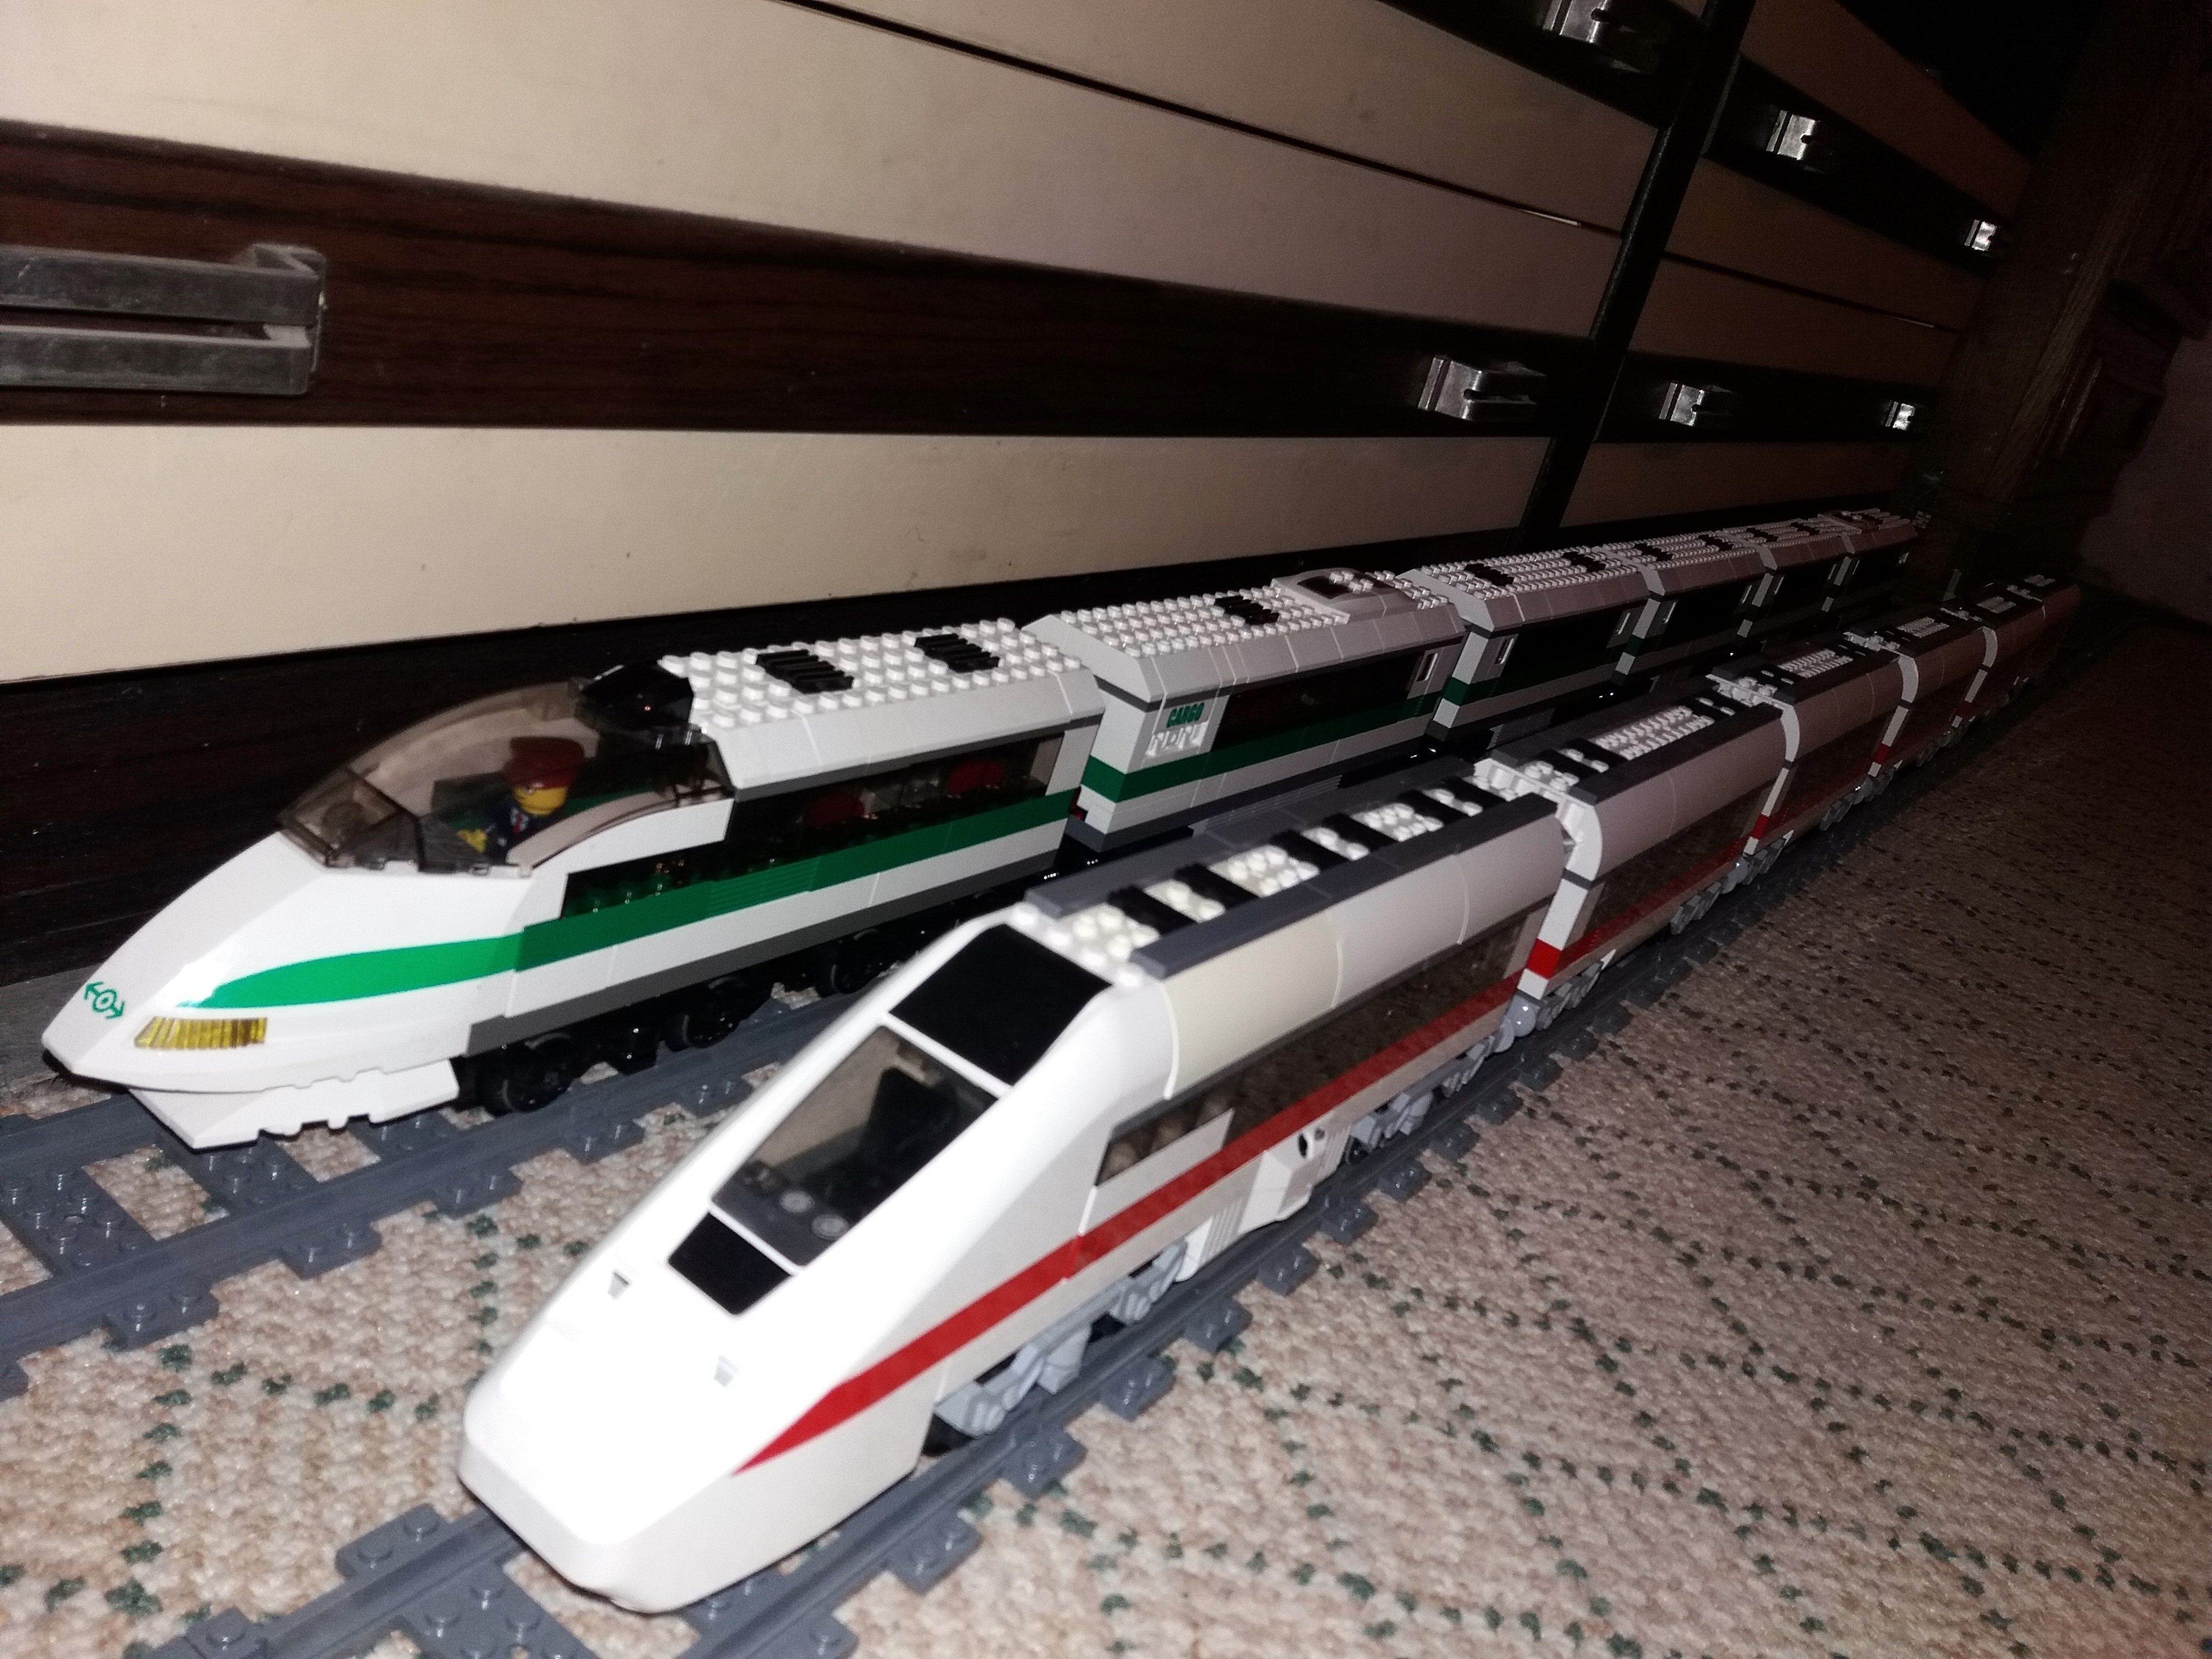 Lego City 7897 Passanger Train Lego World City 4511 High Speed